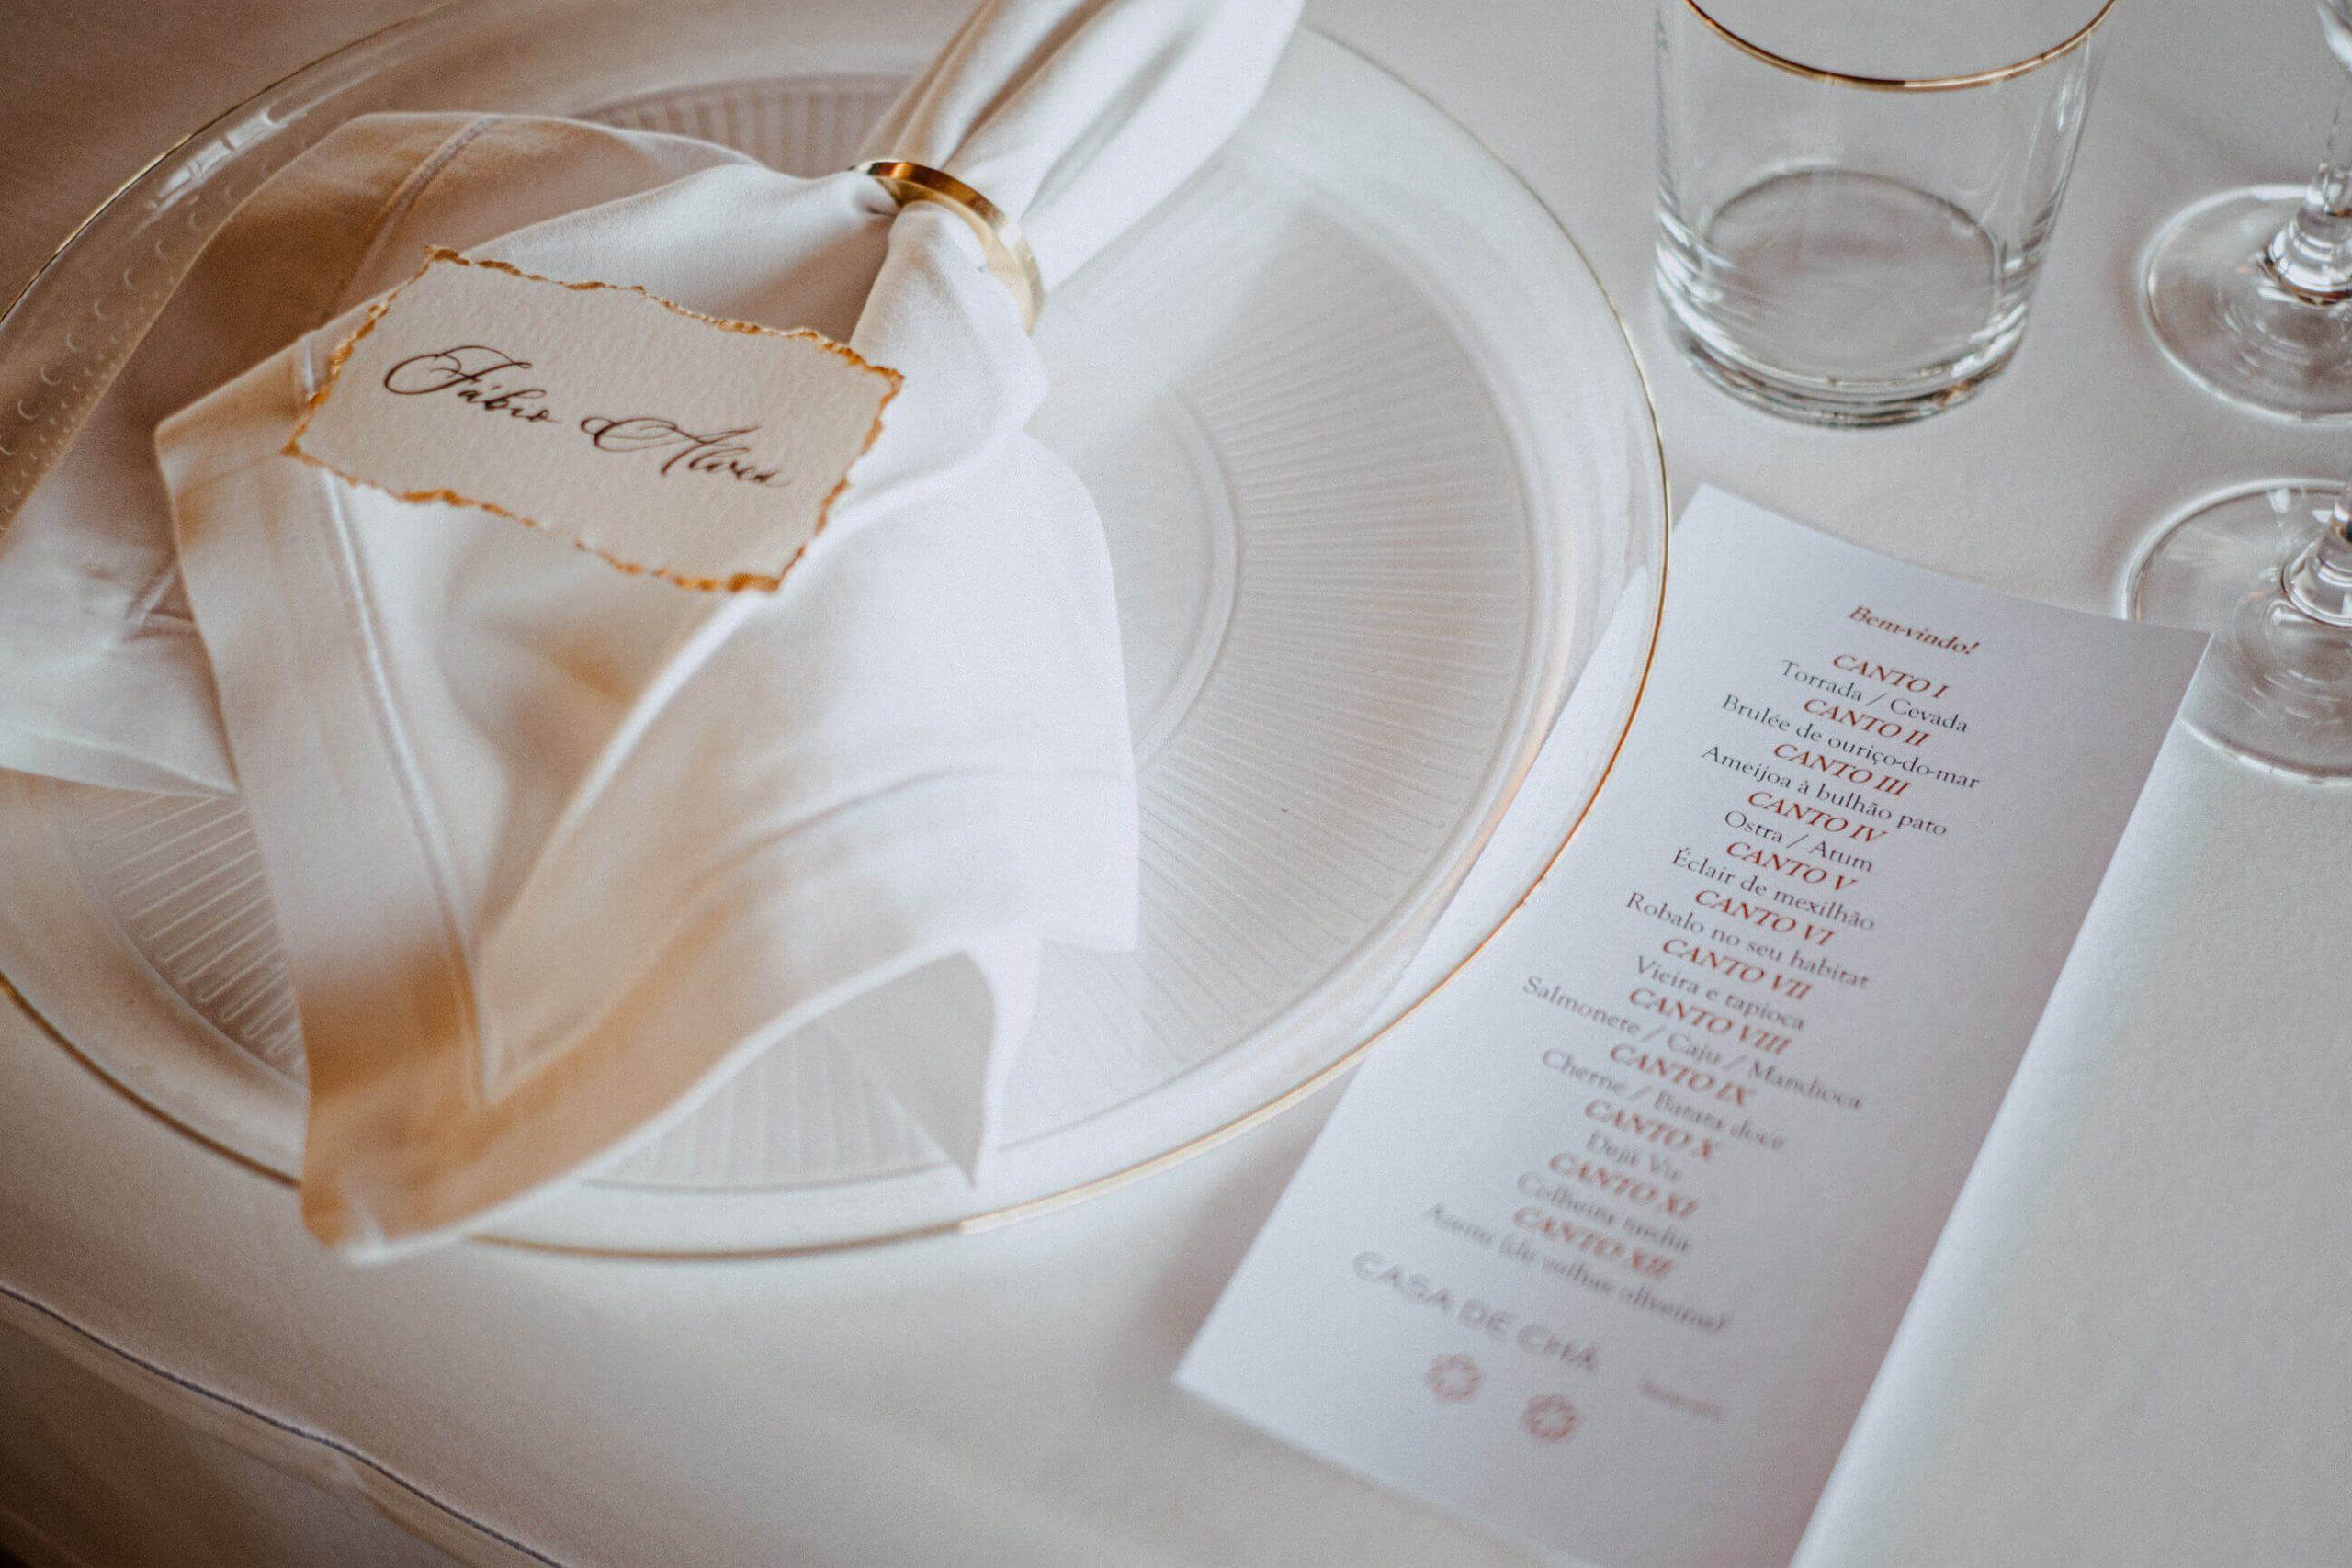 roma-organizacao-eventos-pedido-casamento-casa-de-cha-da-boa-nova-porto-portugal-11